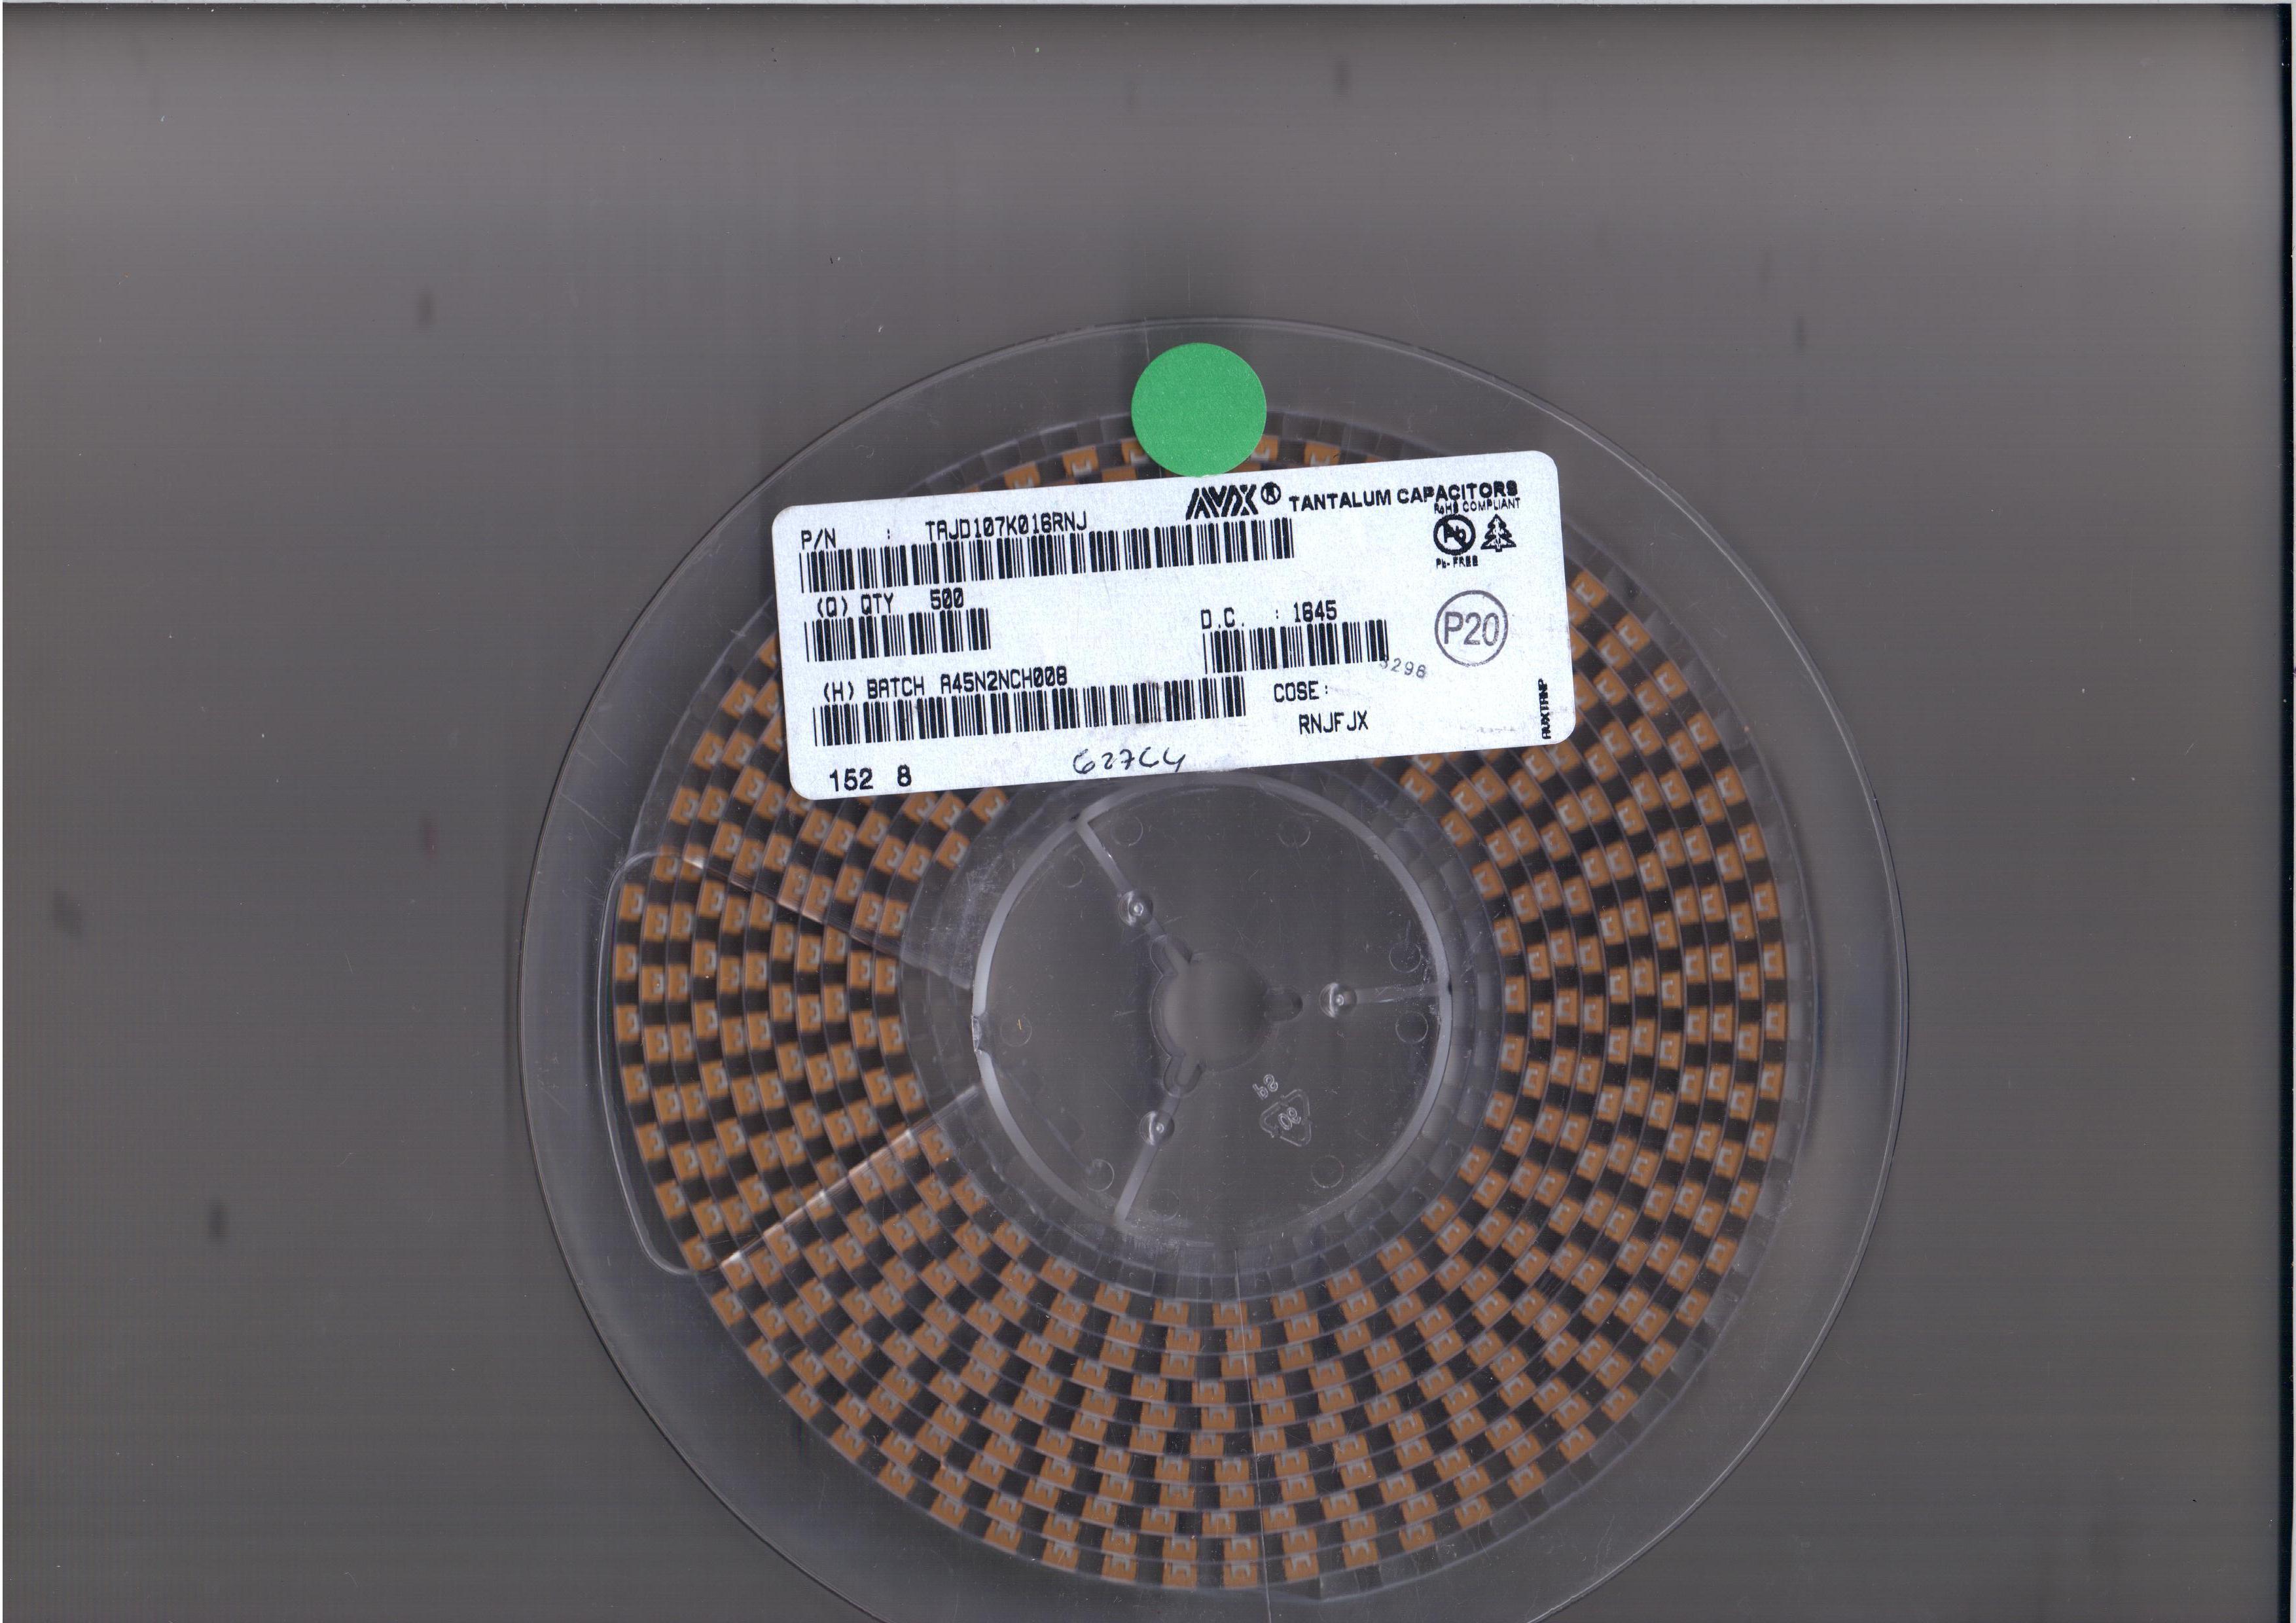 avx钽电容 B型 2.2uF ±10% 35V AVX钽电容授权一级代理直销